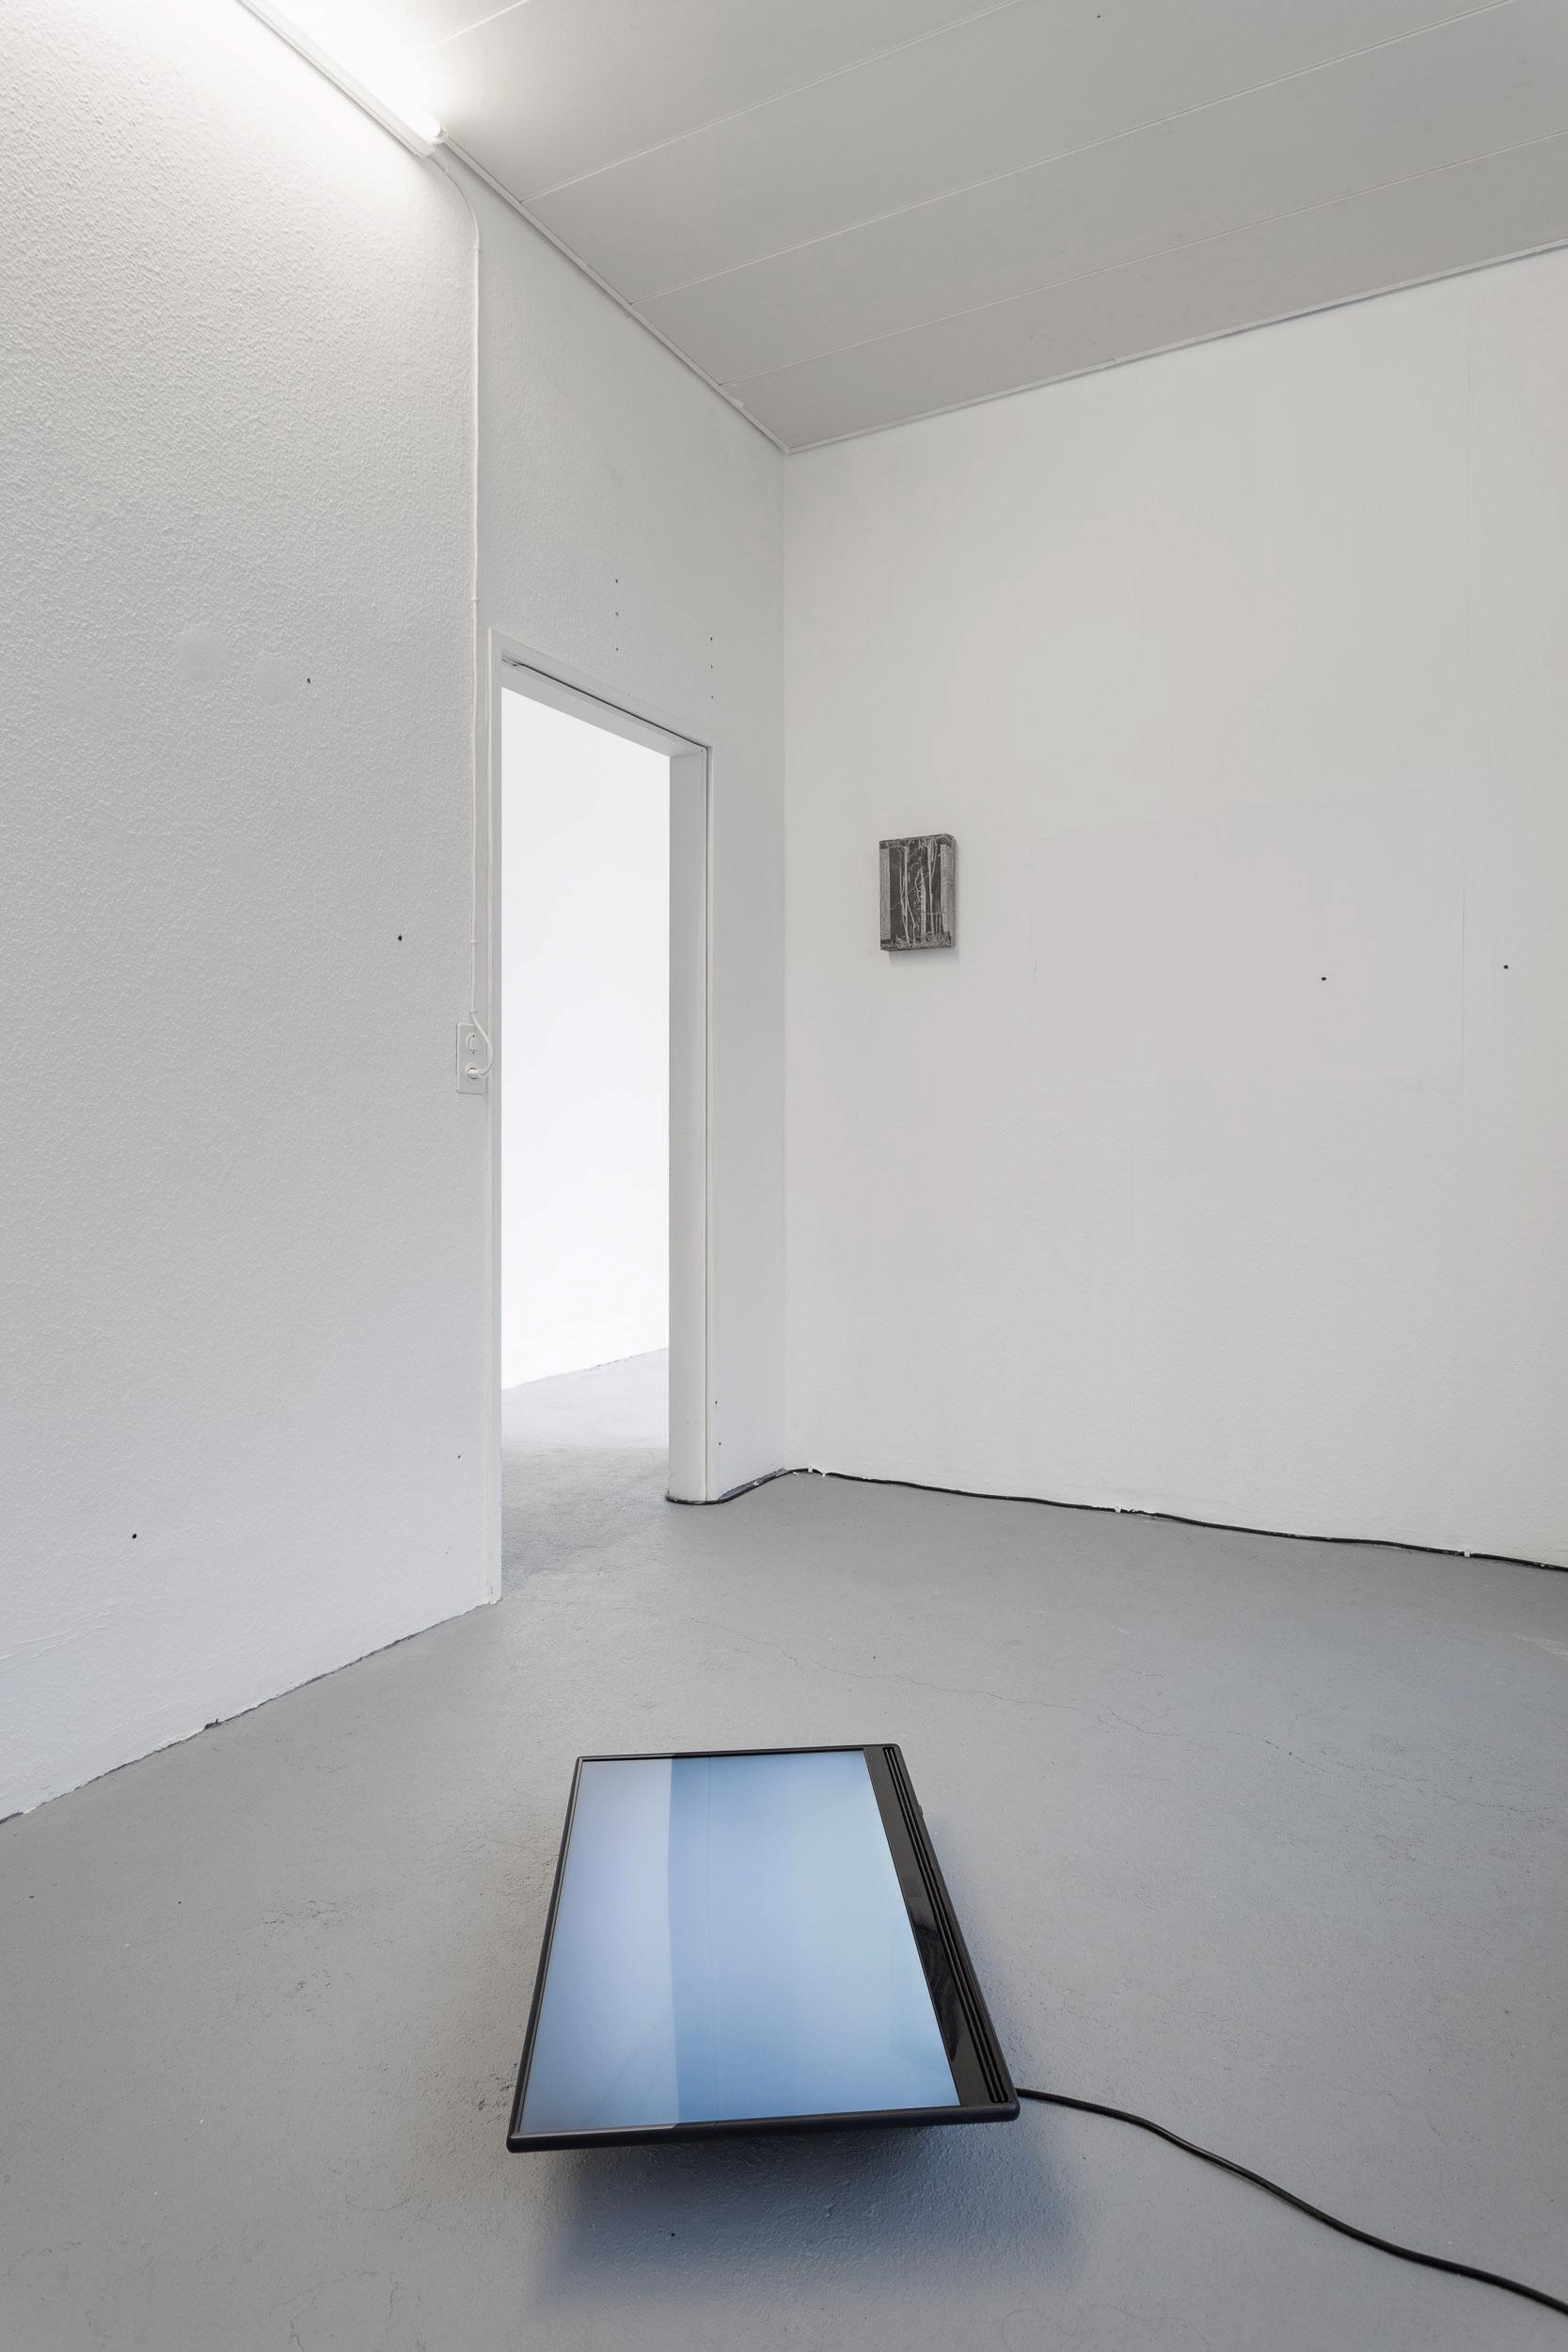 Kong Chun Hei,  Sidestep   Front:  Peeling , 2018, Video, 30:25  Back:  Parcel , 2018,Ink on paper mounted on wooden frame, 20 x 30 x 5cm  Photo: Kilian Bannwart